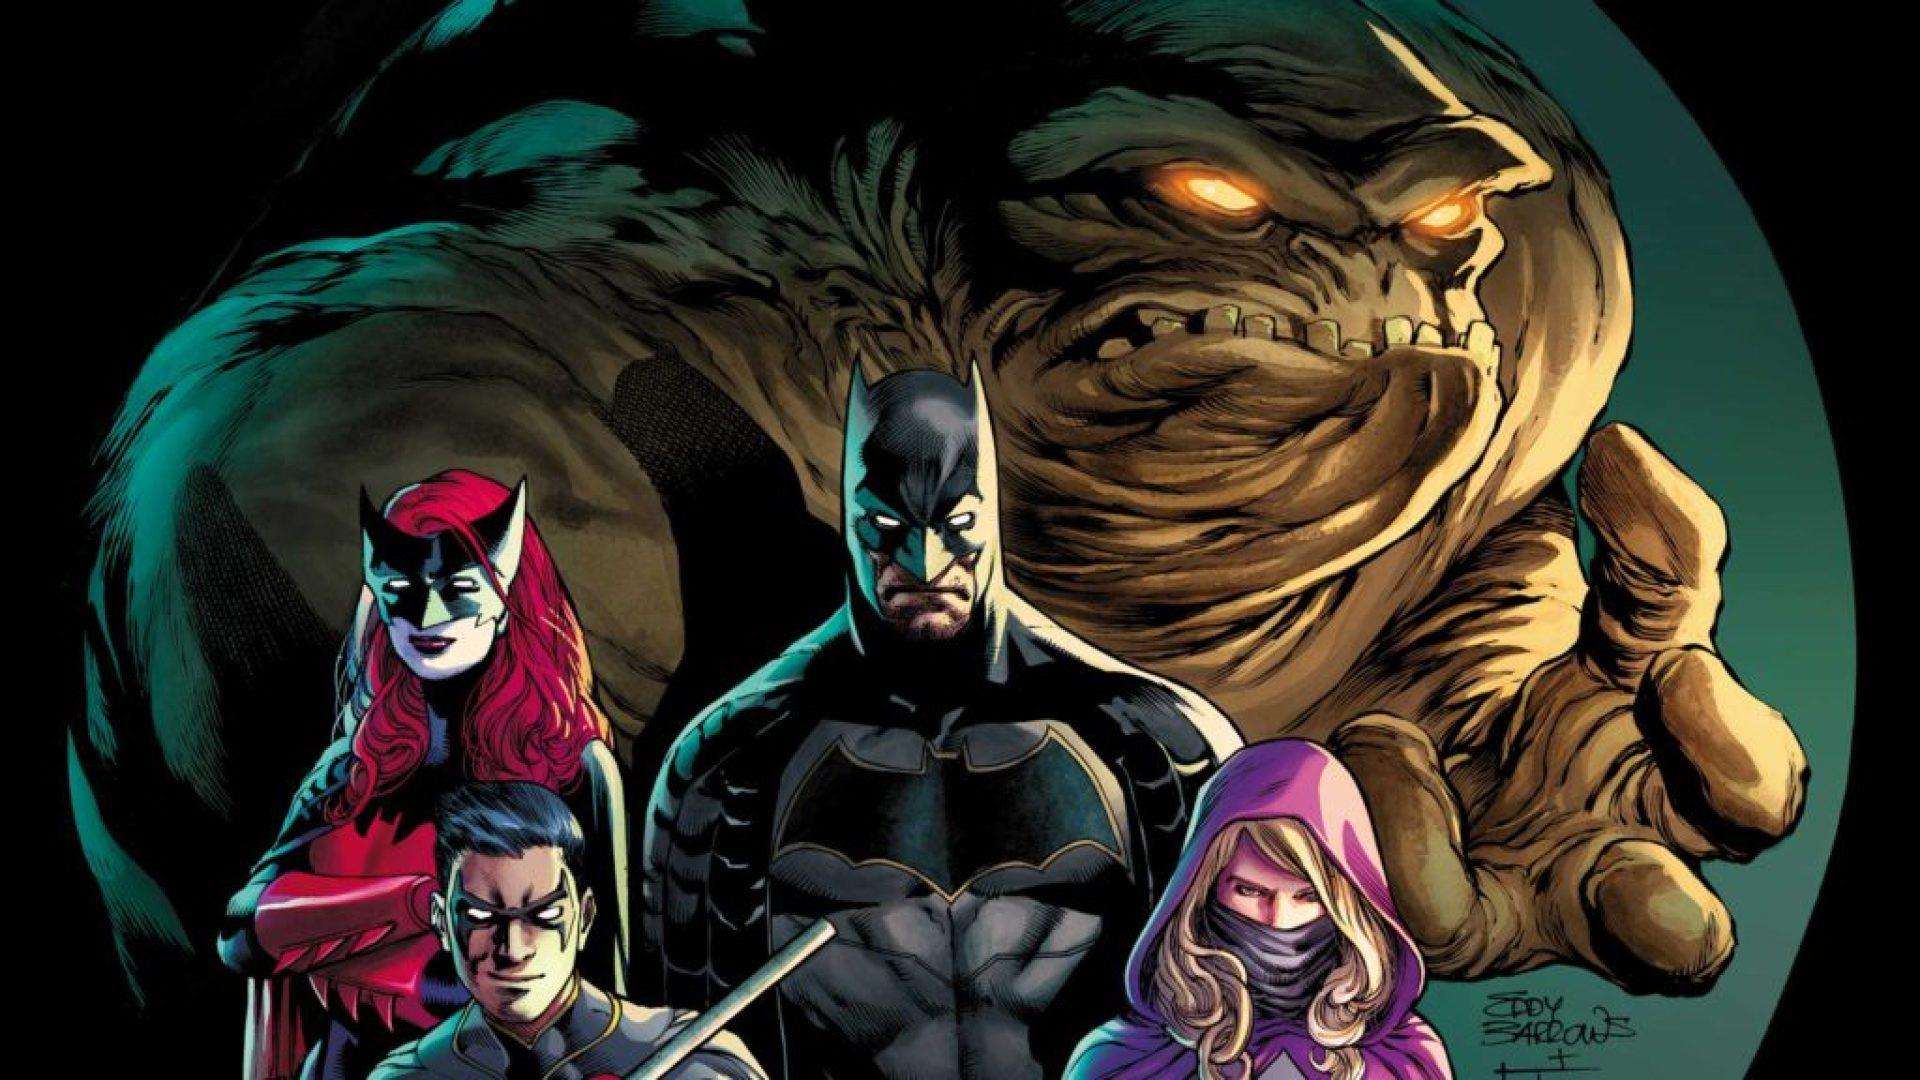 DC Rebirth's Detective Comics led by Batwoman and Batman